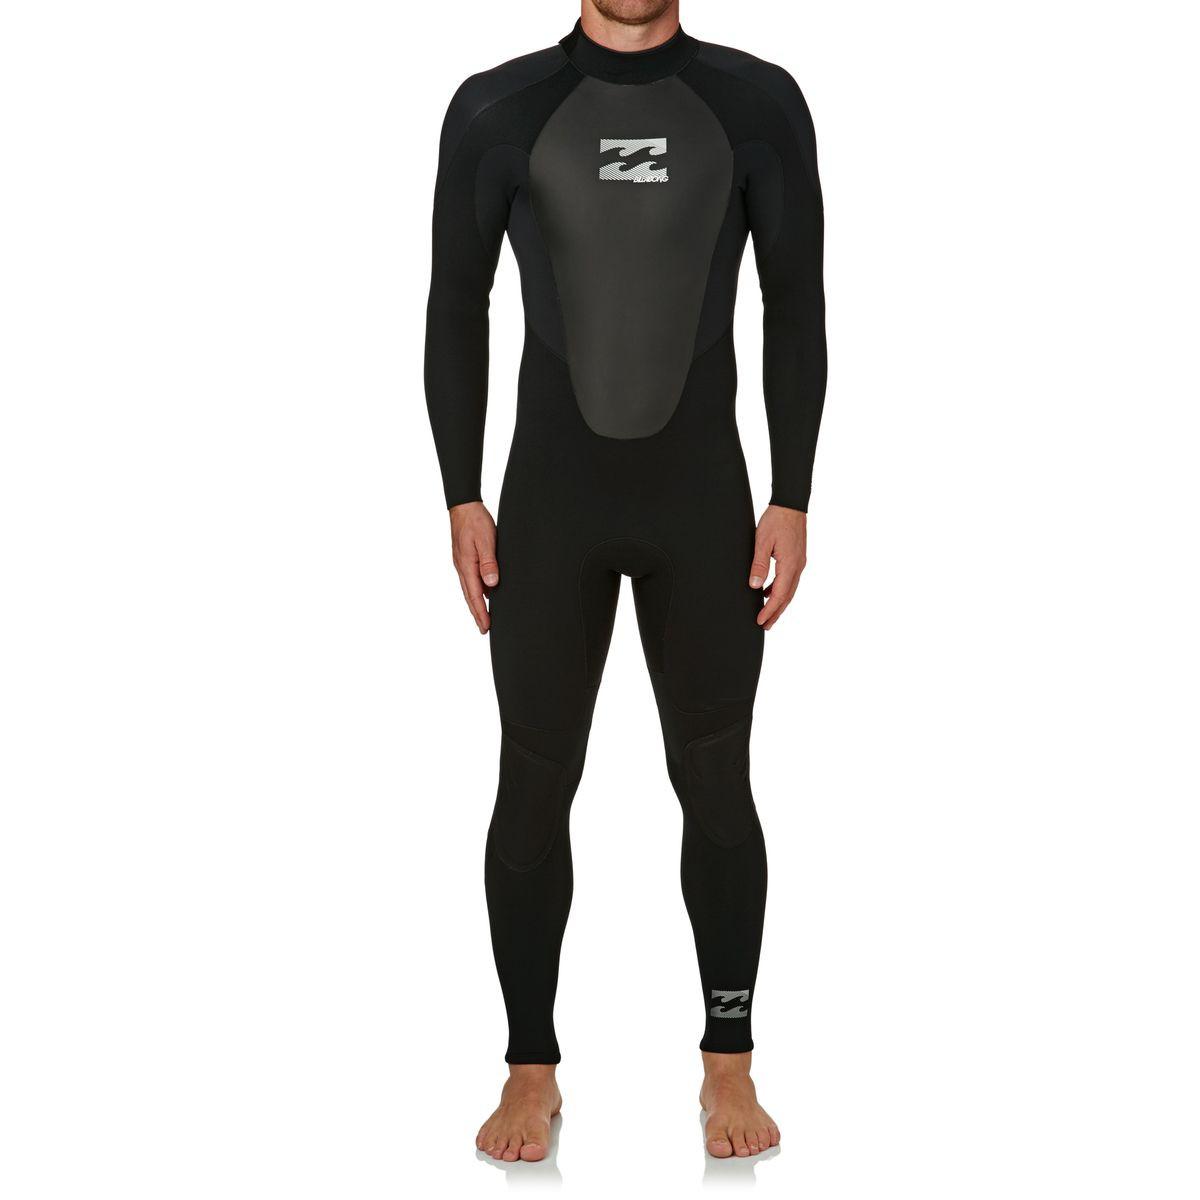 Billabong Intruder GBS 5/4mm 2018 Back Zip Wetsuit - Black